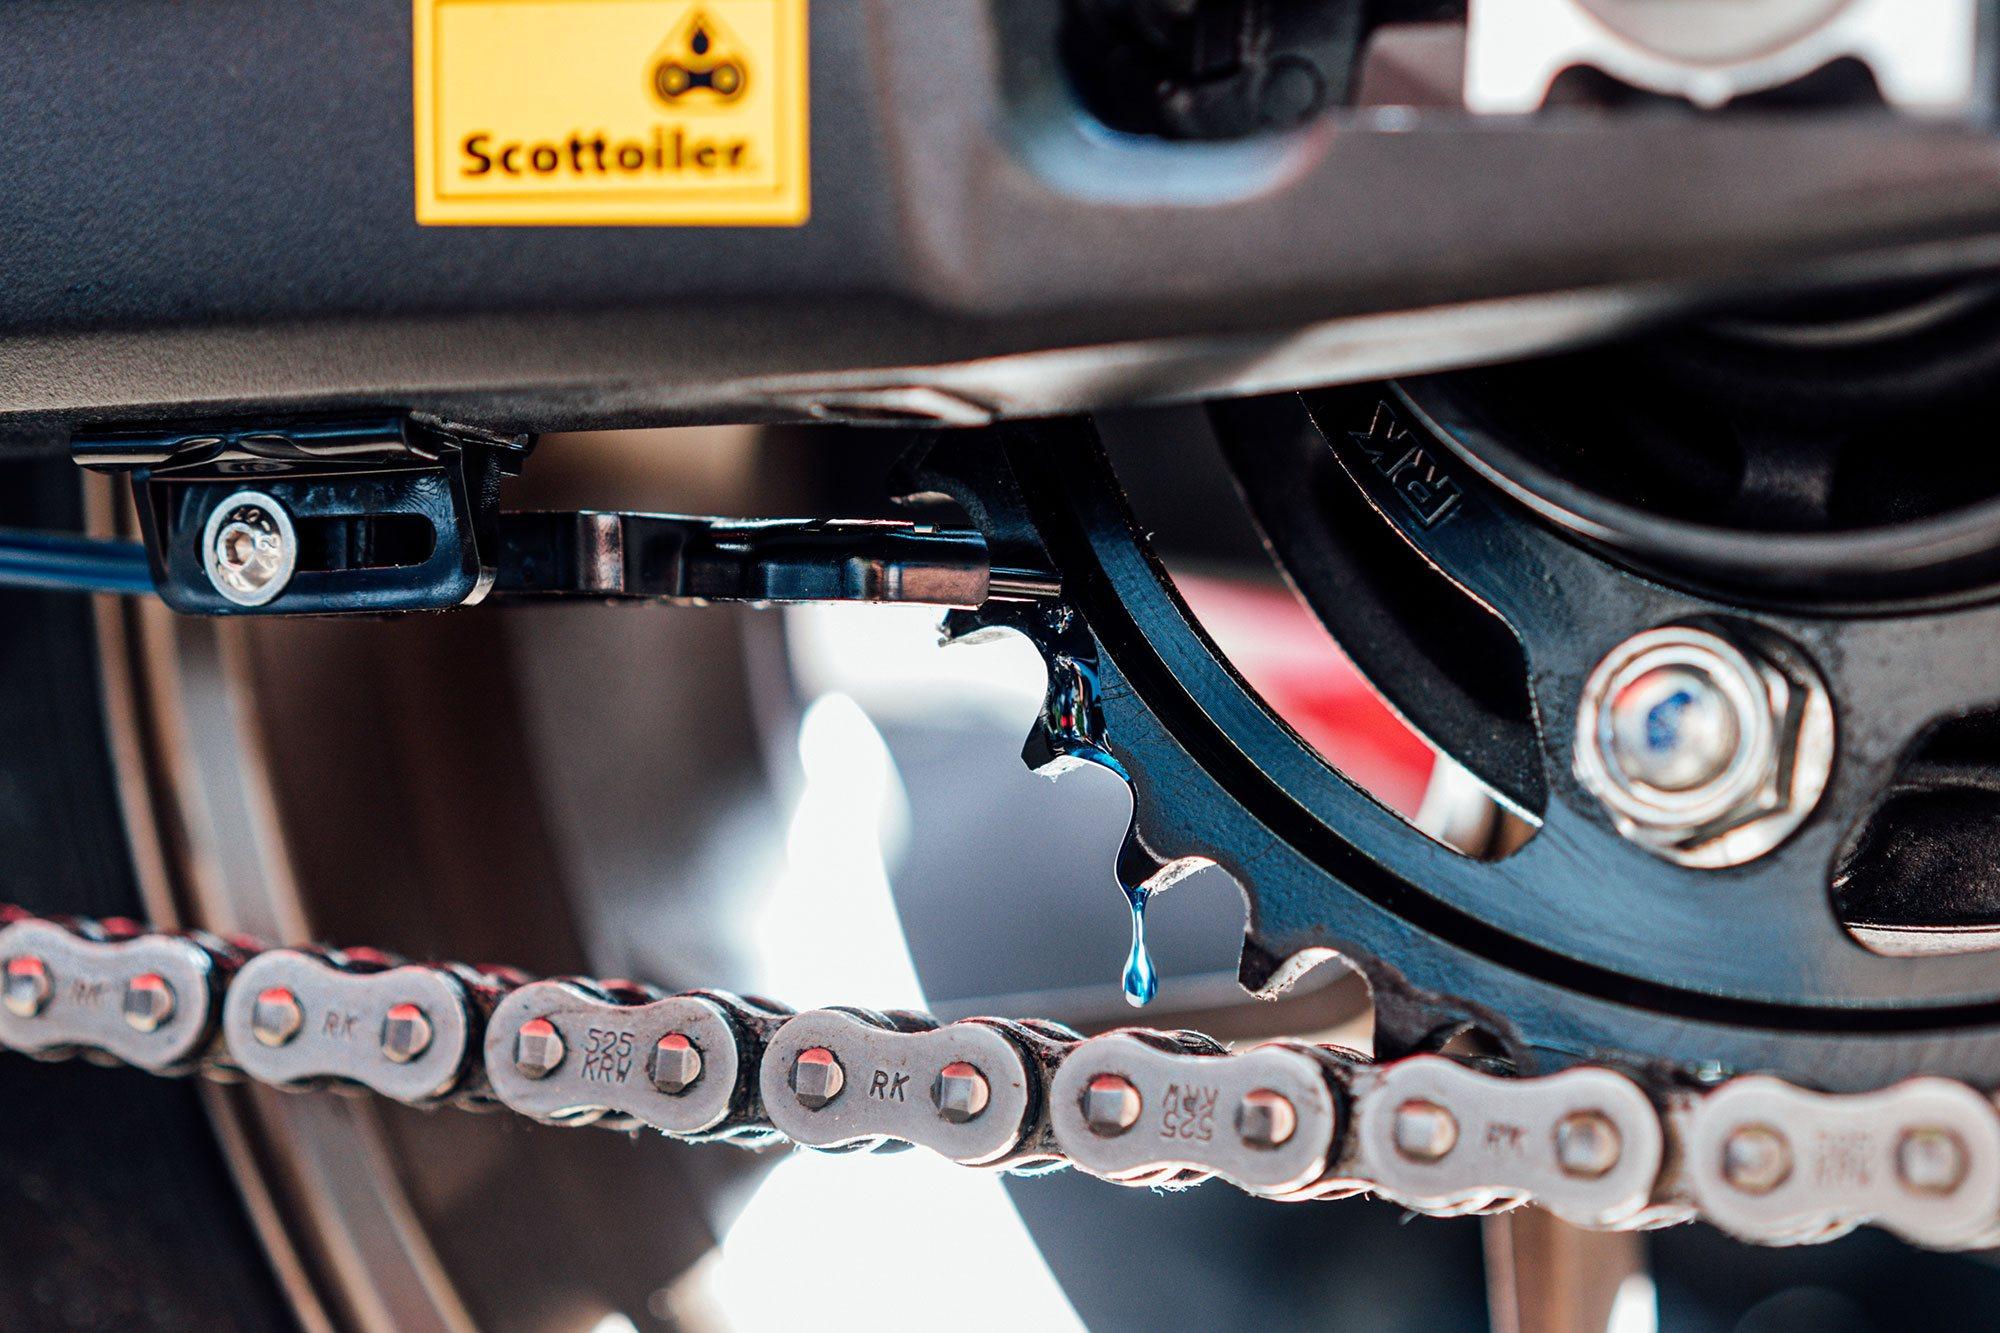 Scottoiler V-system review 2